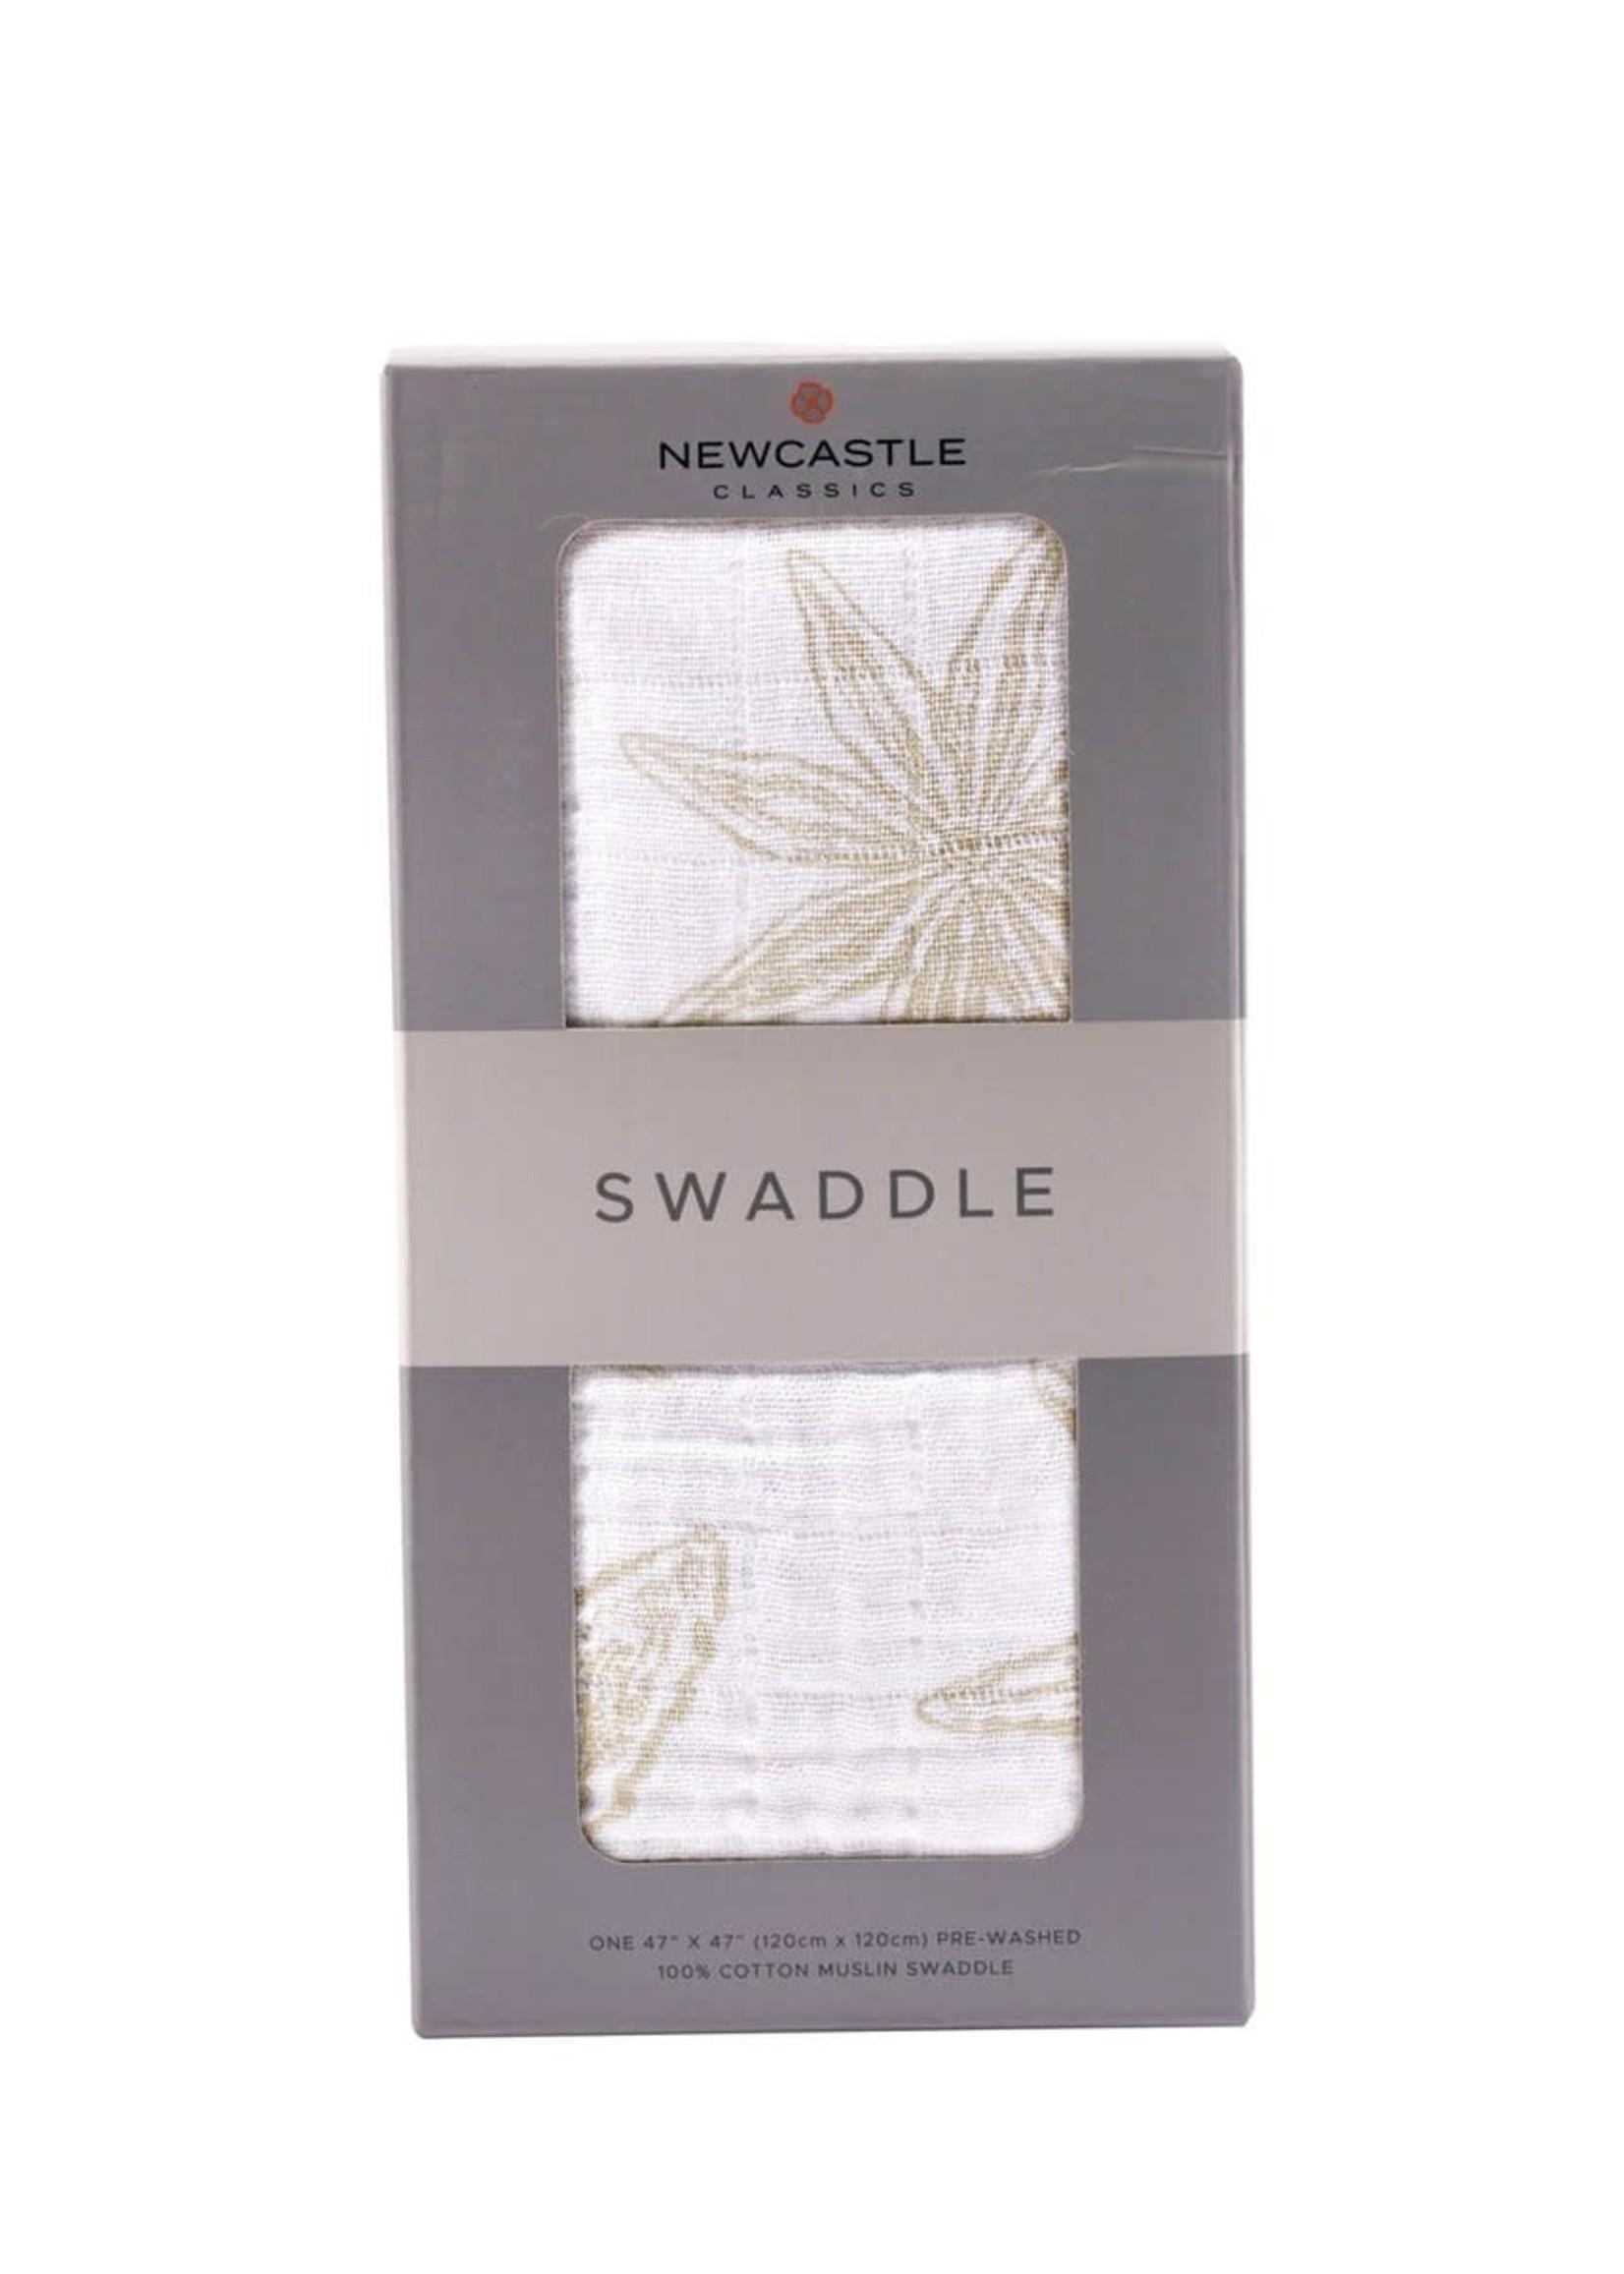 Newcastle Classics Star Anise Swaddle